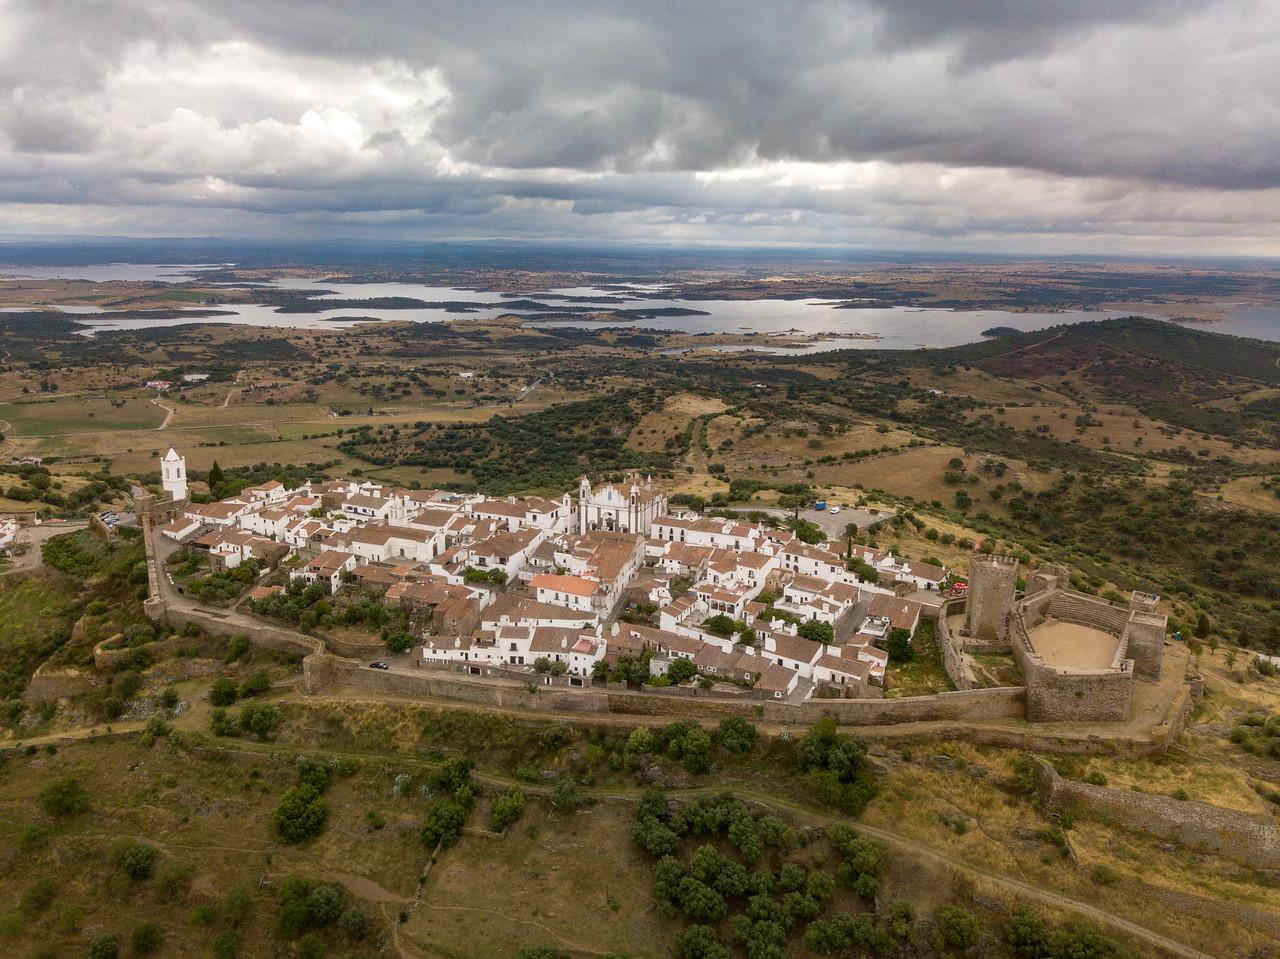 Drone Image of Montsaraz, Portugal